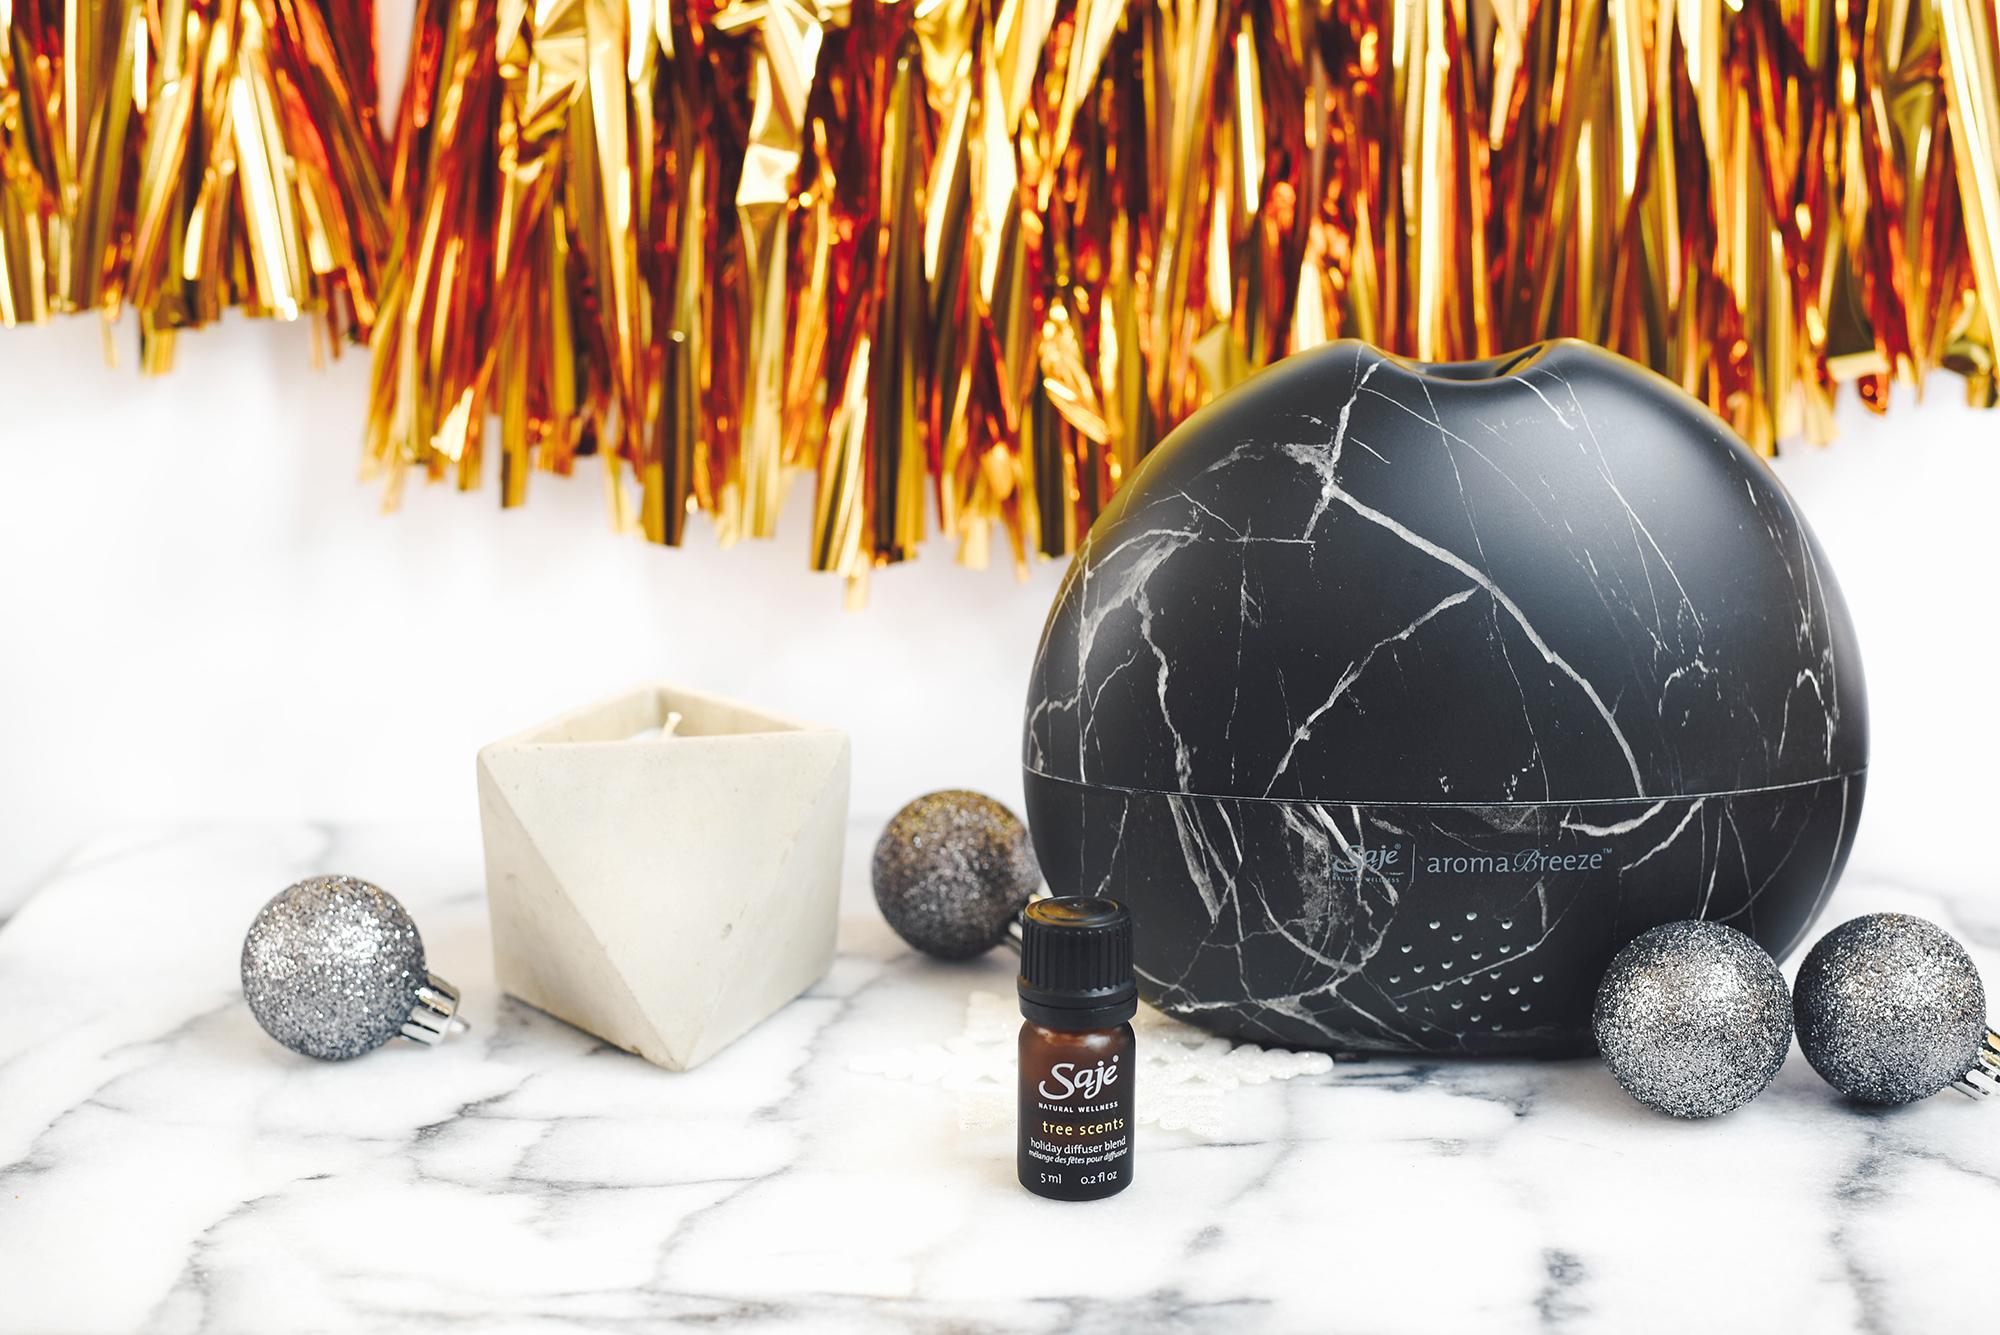 Holiday gift ideas, saje wellness, nebulizer